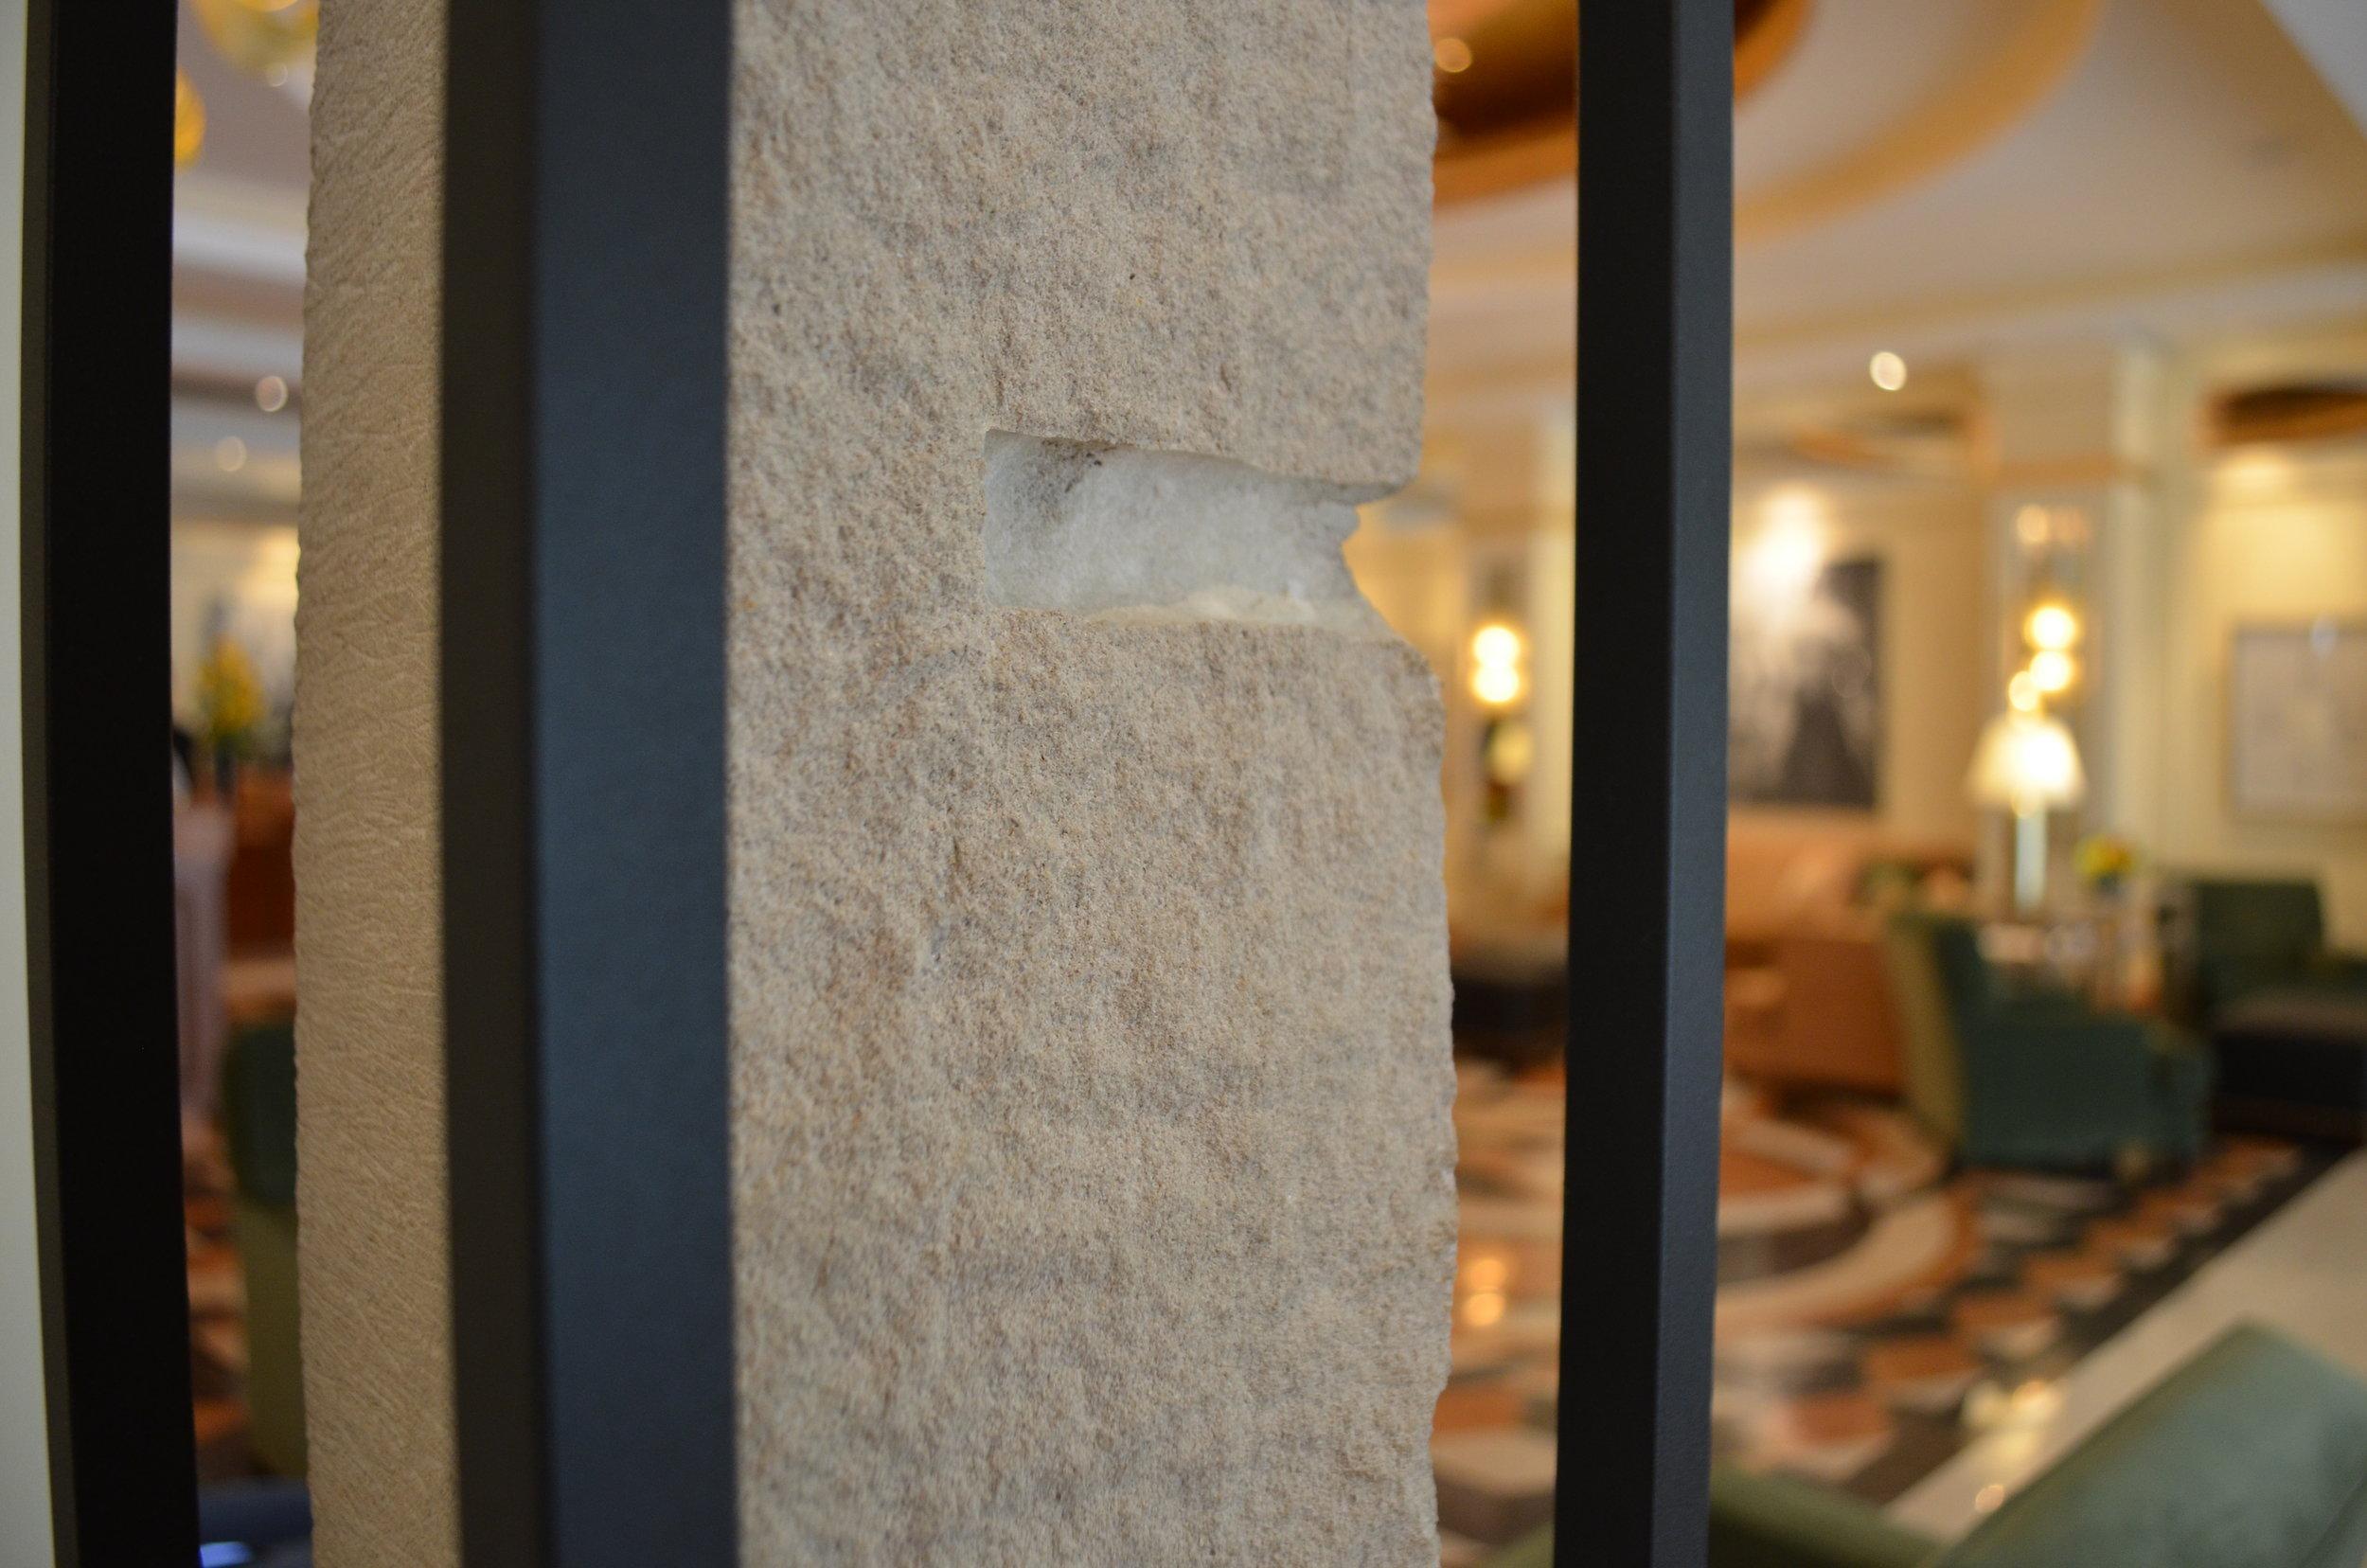 detail image of dale enochs' 215 lbs limestone sculpture